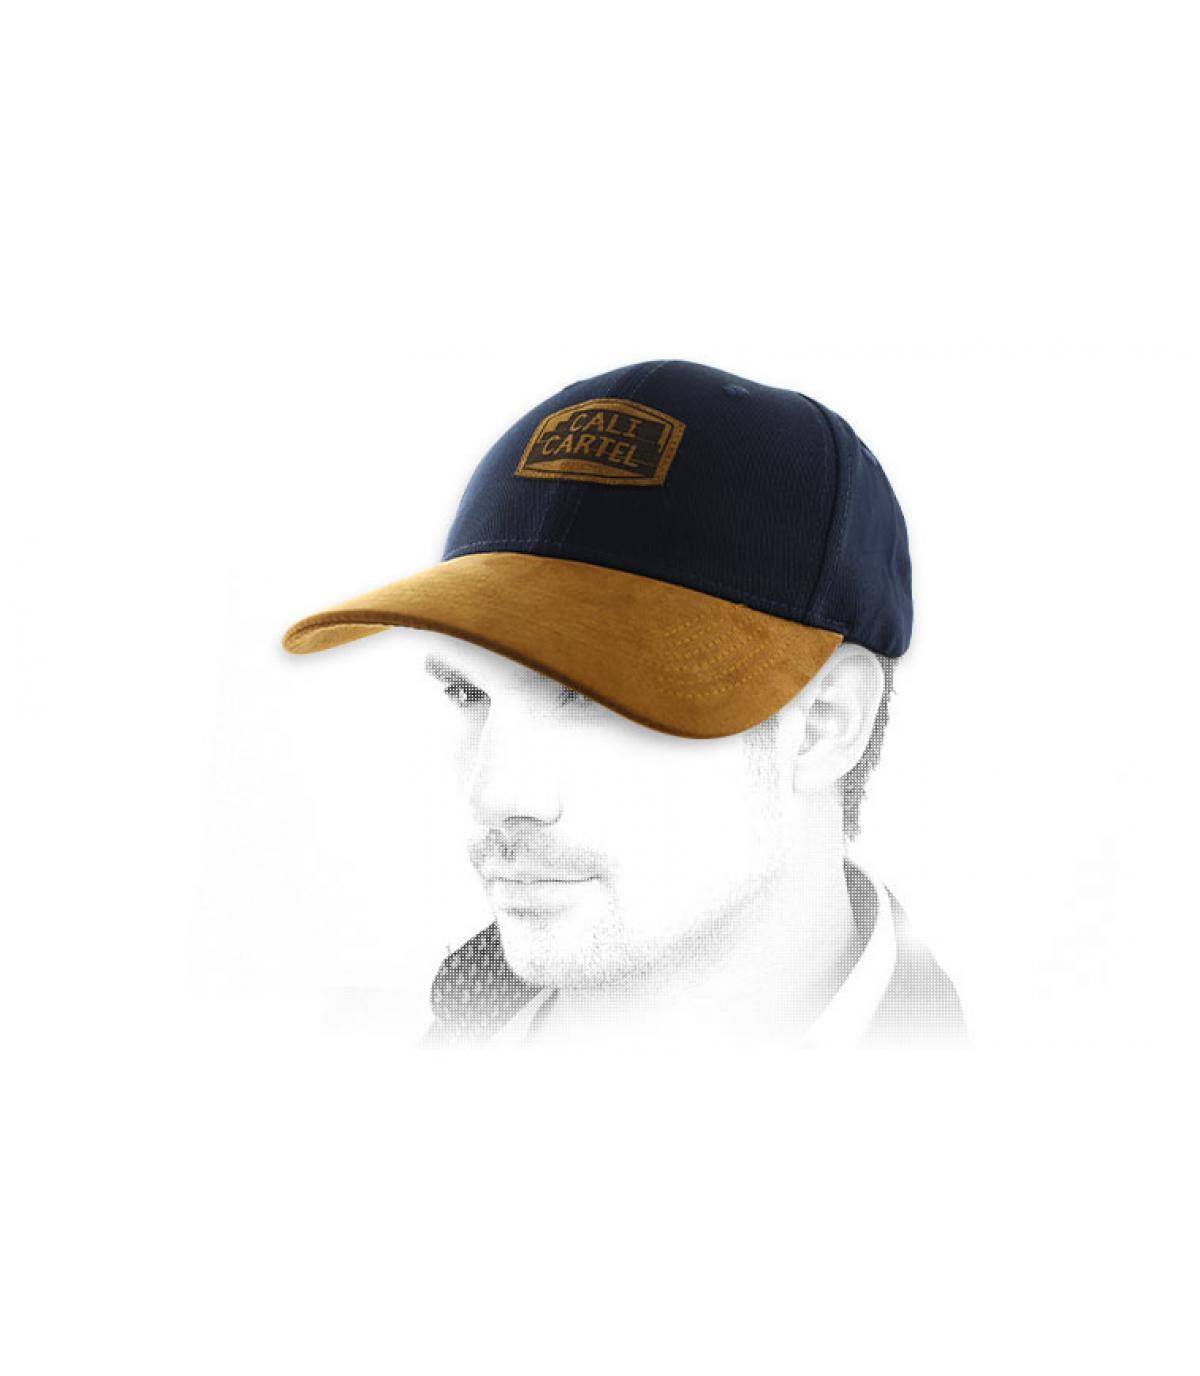 gorra Cali Cartel azul